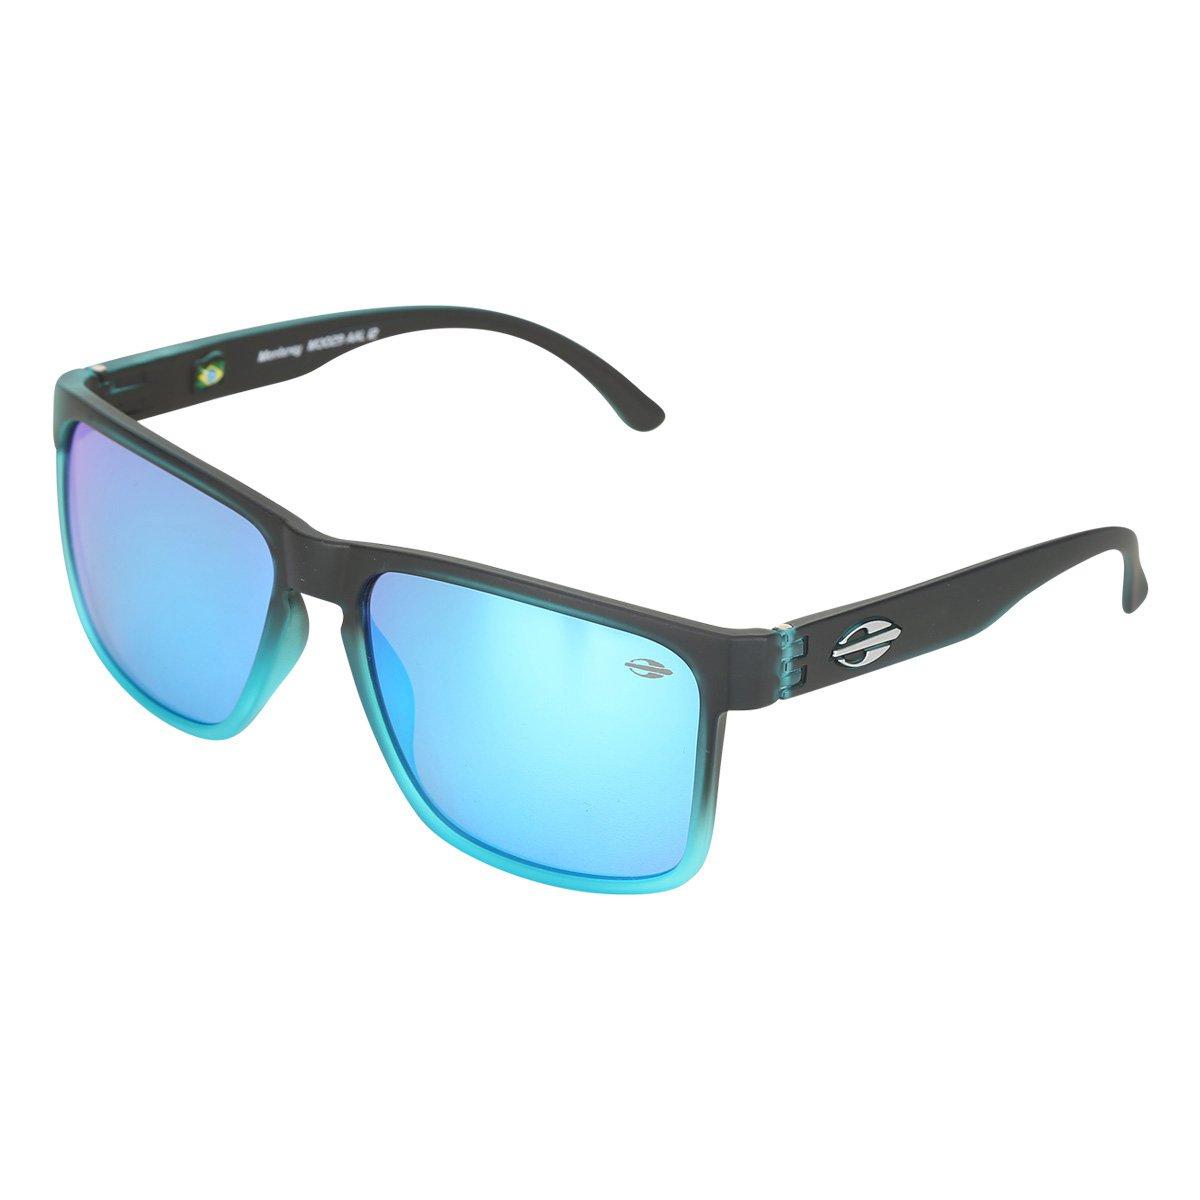 6f3b6eaf8 Óculos de Sol Mormaii Monterey Masculino